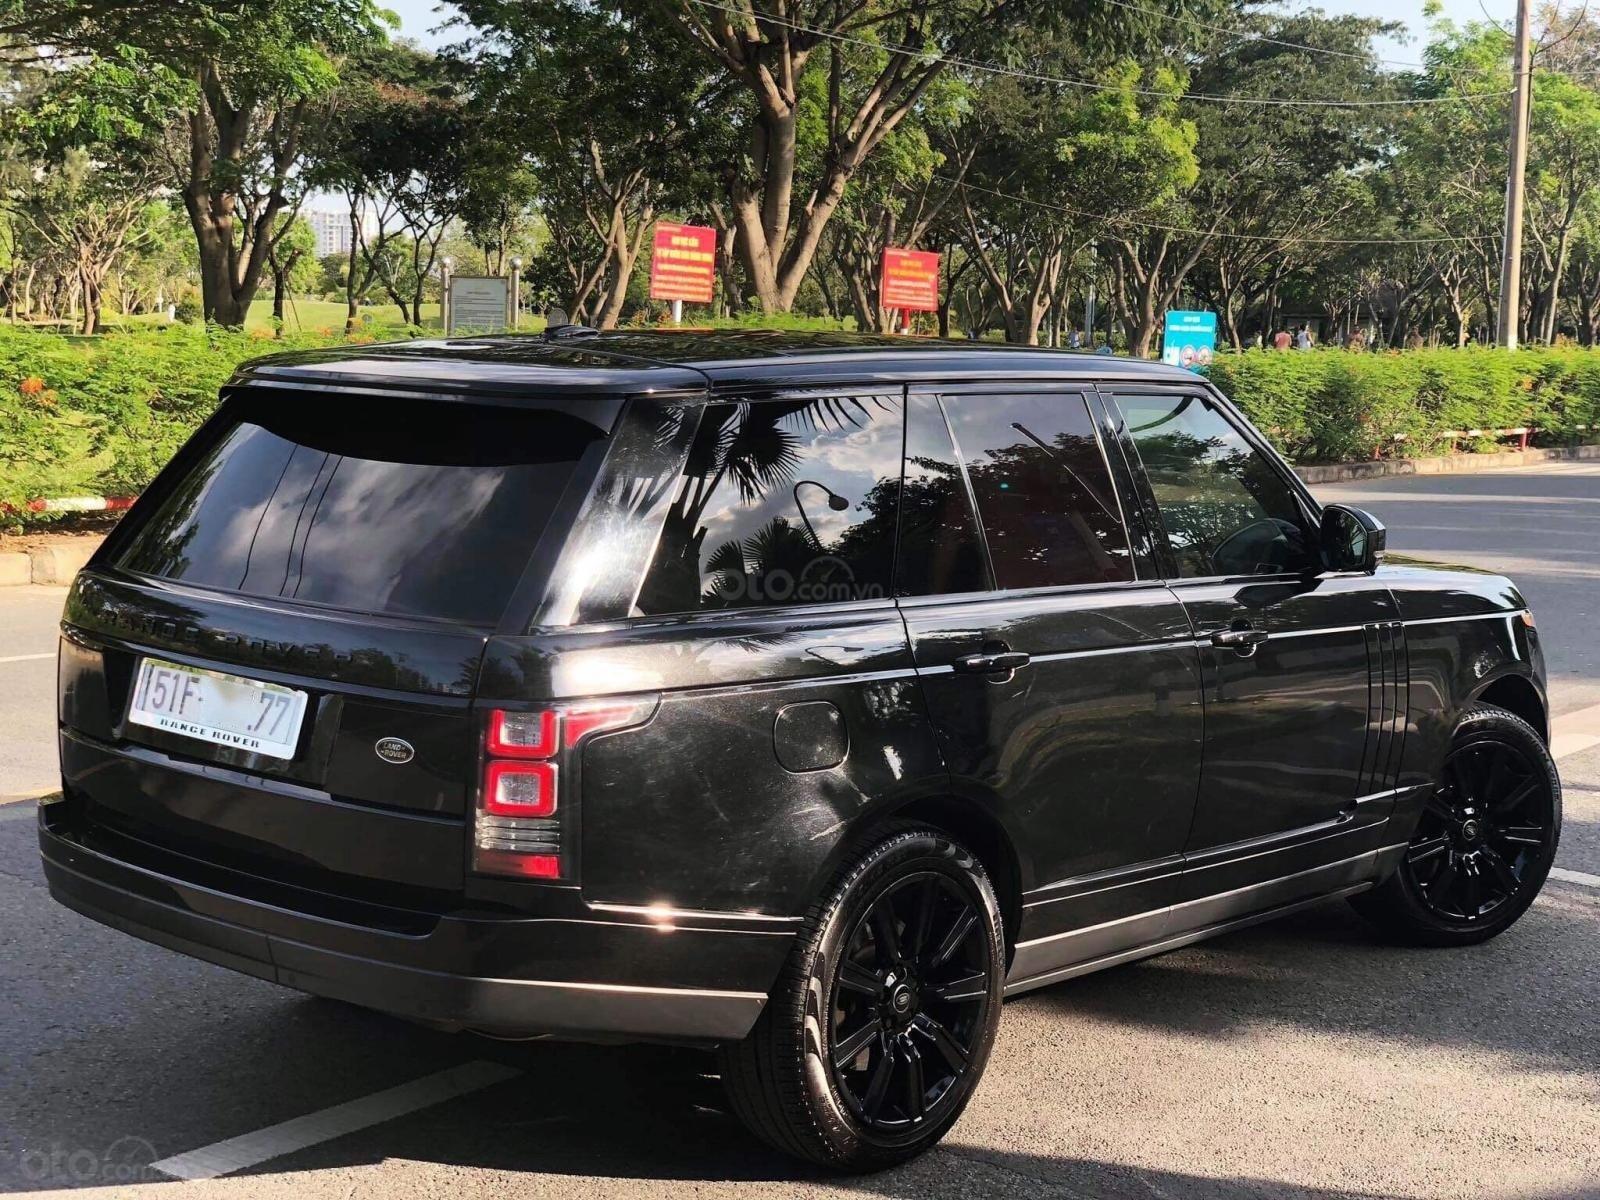 Cần bán LandRover Range Rover HSE đời 2016, màu đen, xe nhập-2